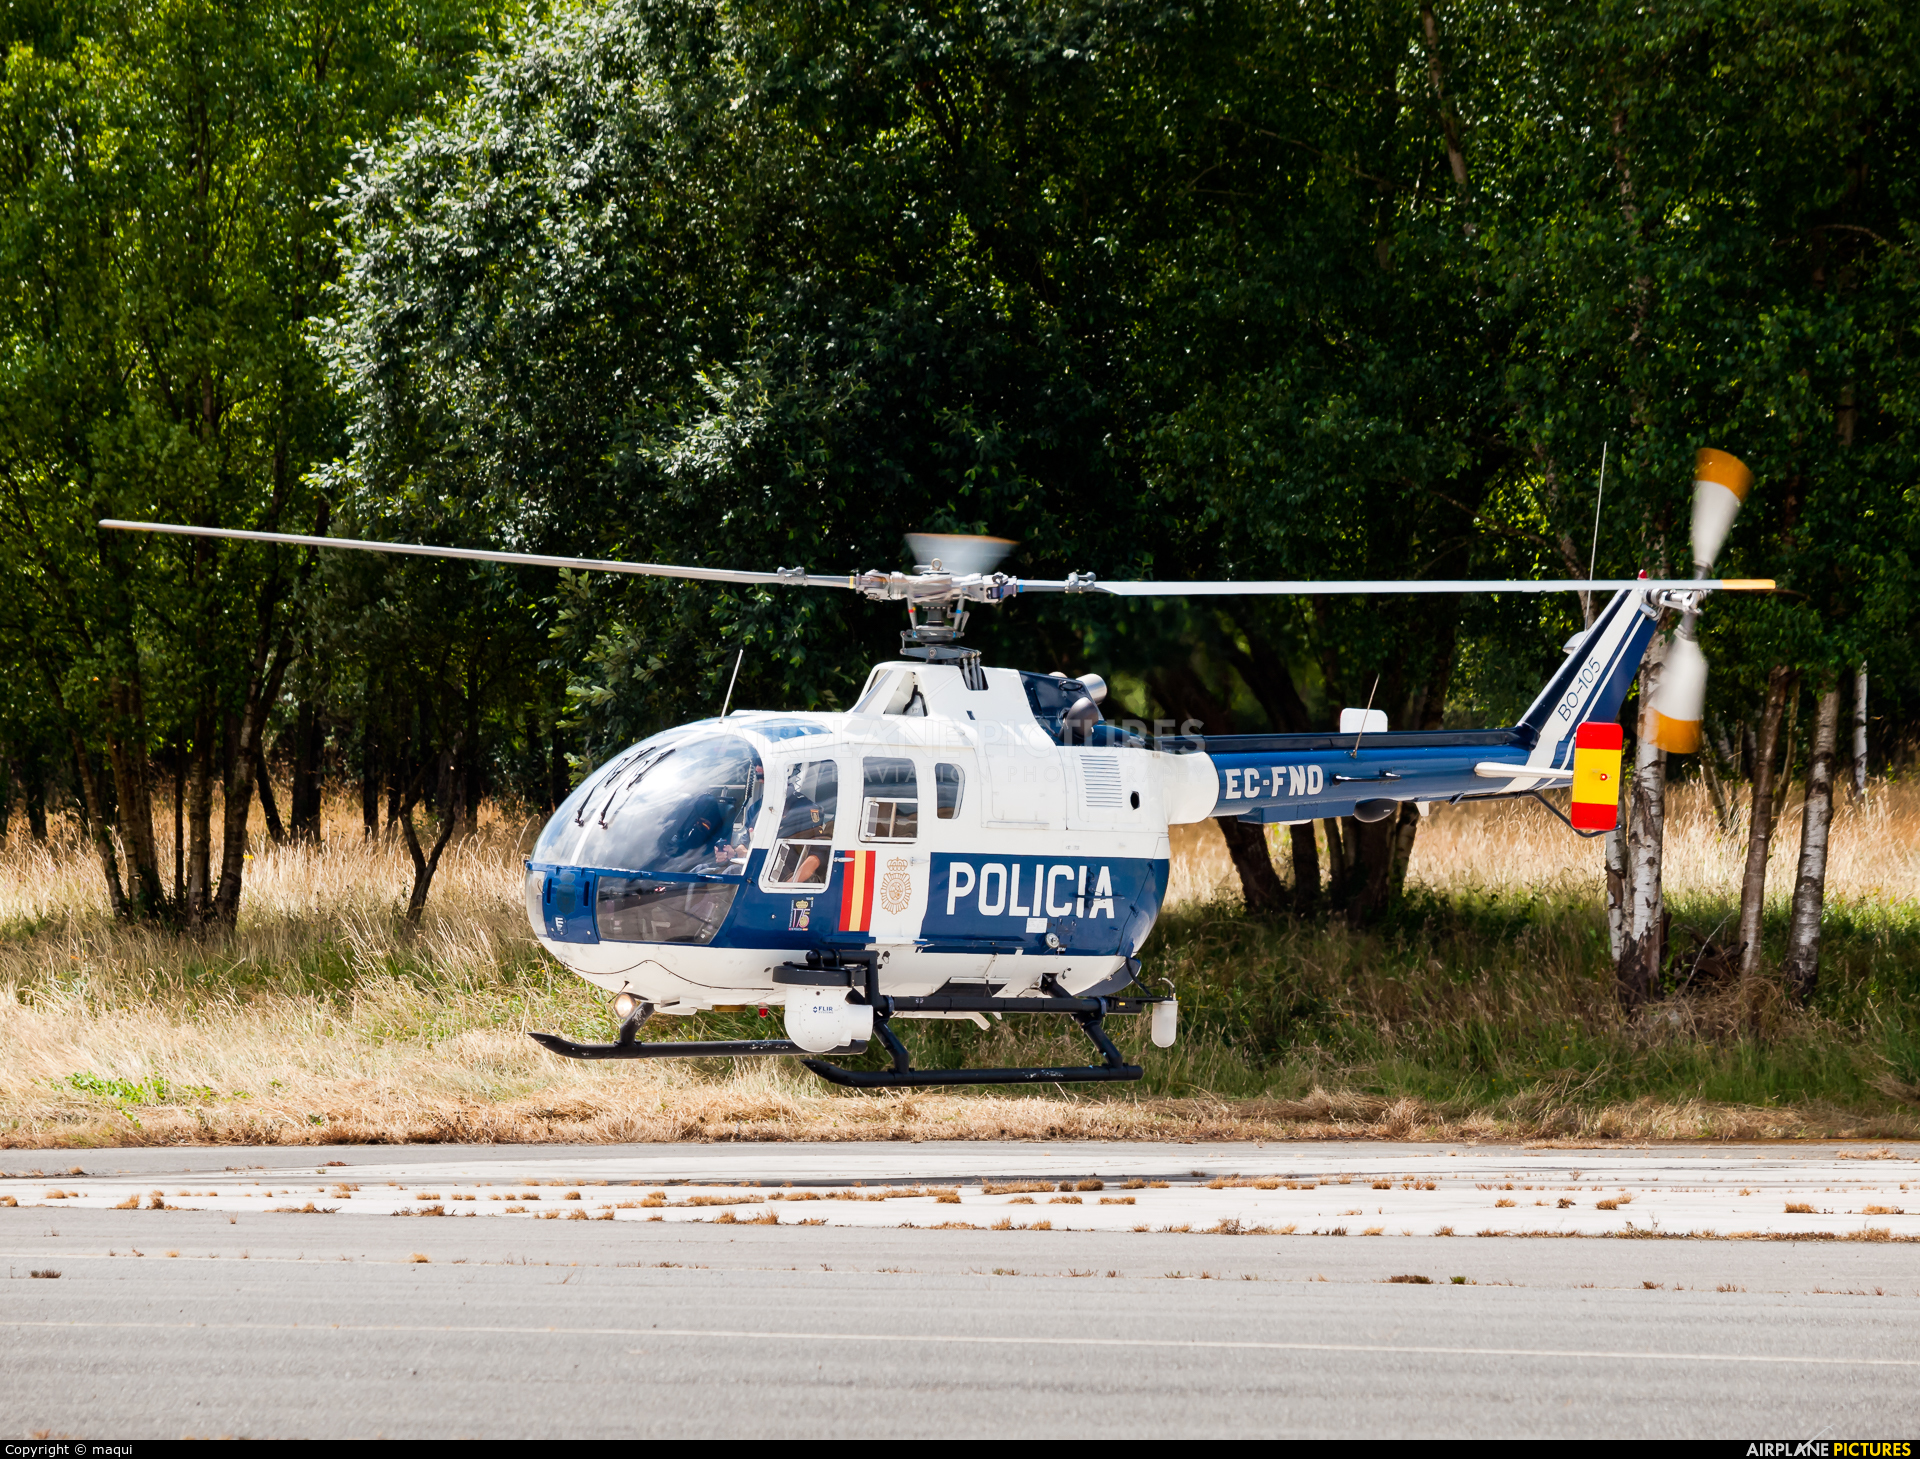 Spain - Police EC-FNO aircraft at Lugo - Rozas